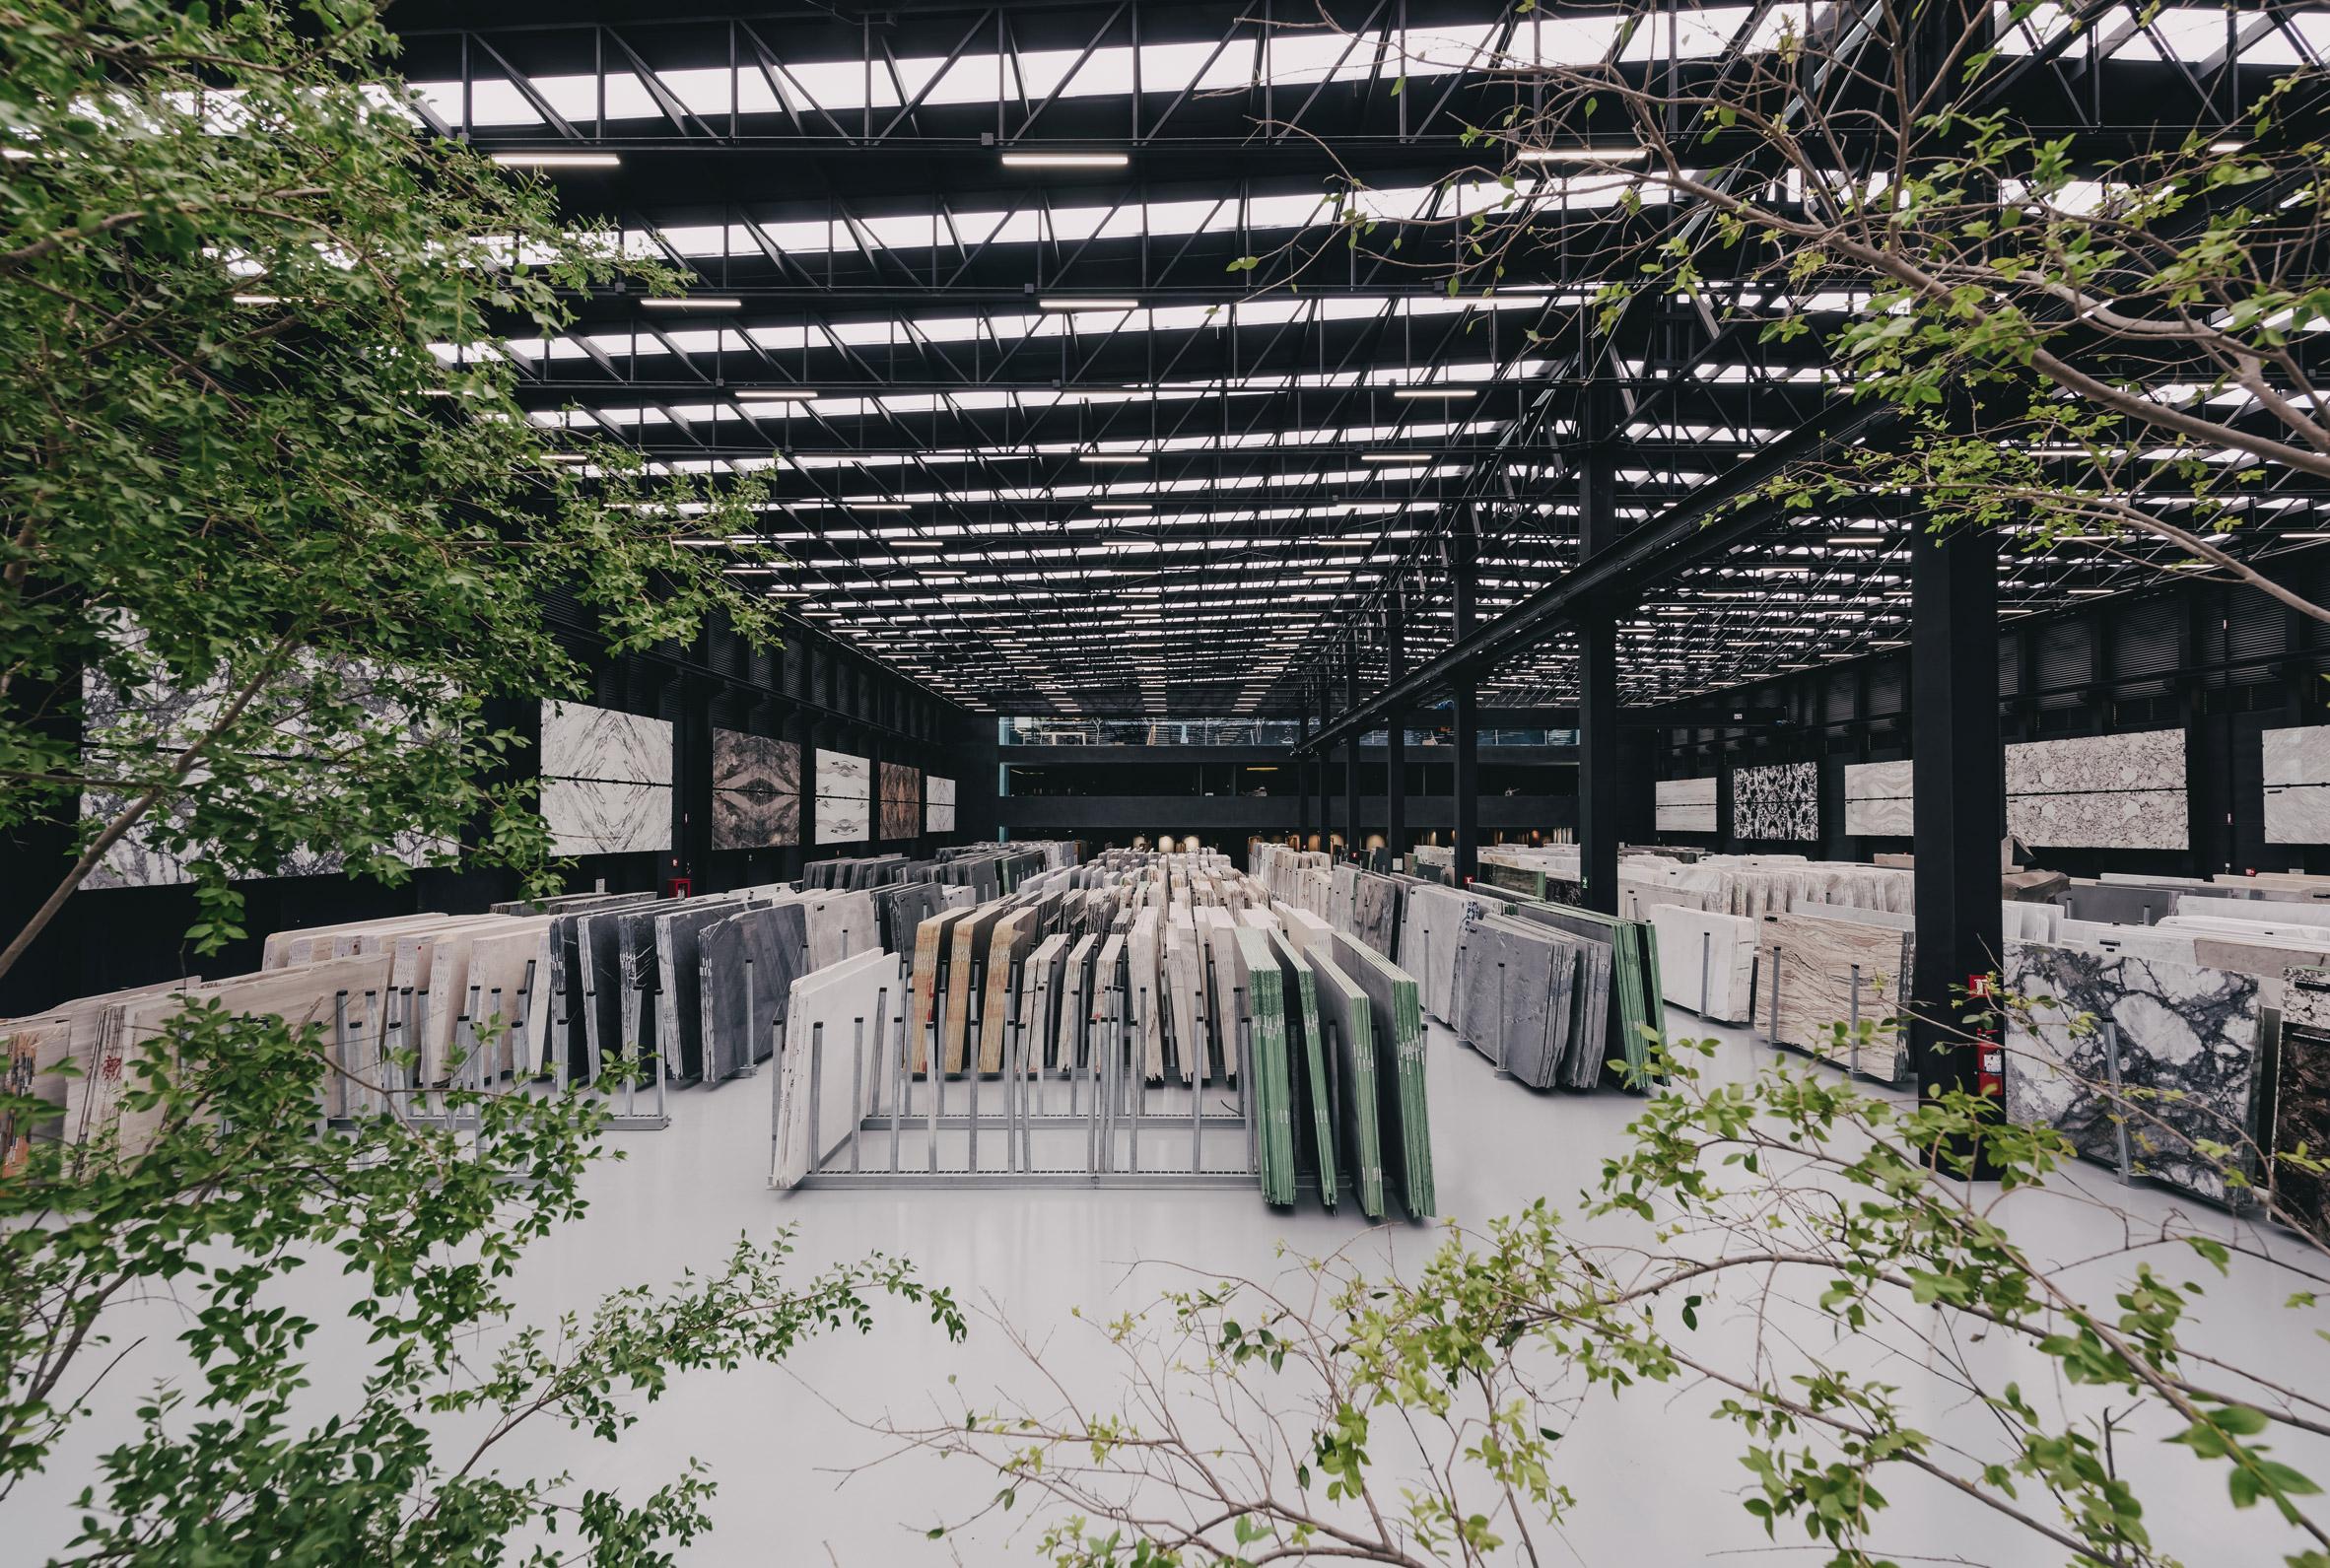 grupo-arca-showroom-store-cultural-centre-esrawe-studio-guadalajara-mexico_dezeen_2364_col_27